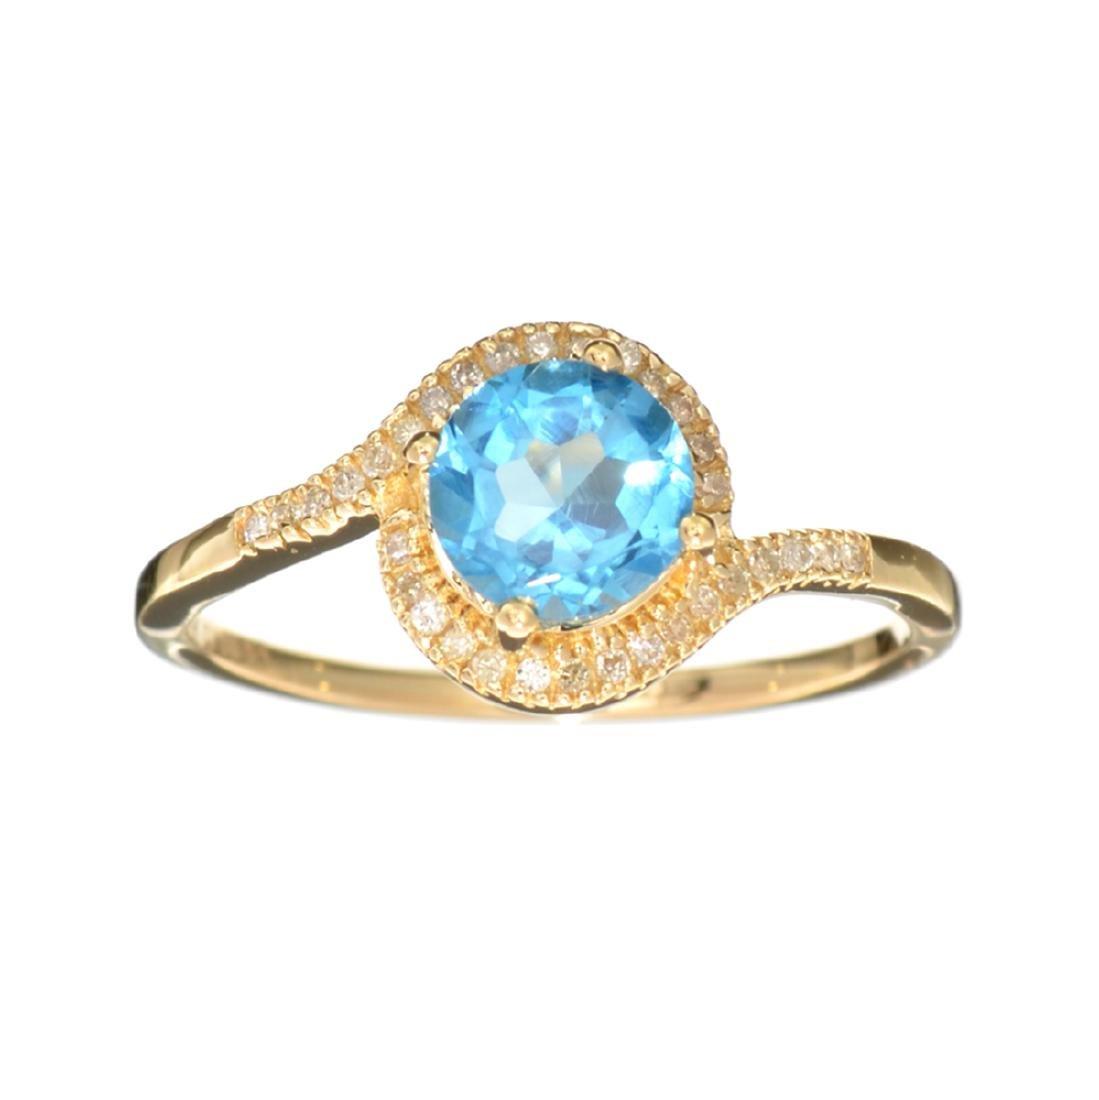 Designer Sebastian 14KT Gold 1.09CT Blue Topaz and